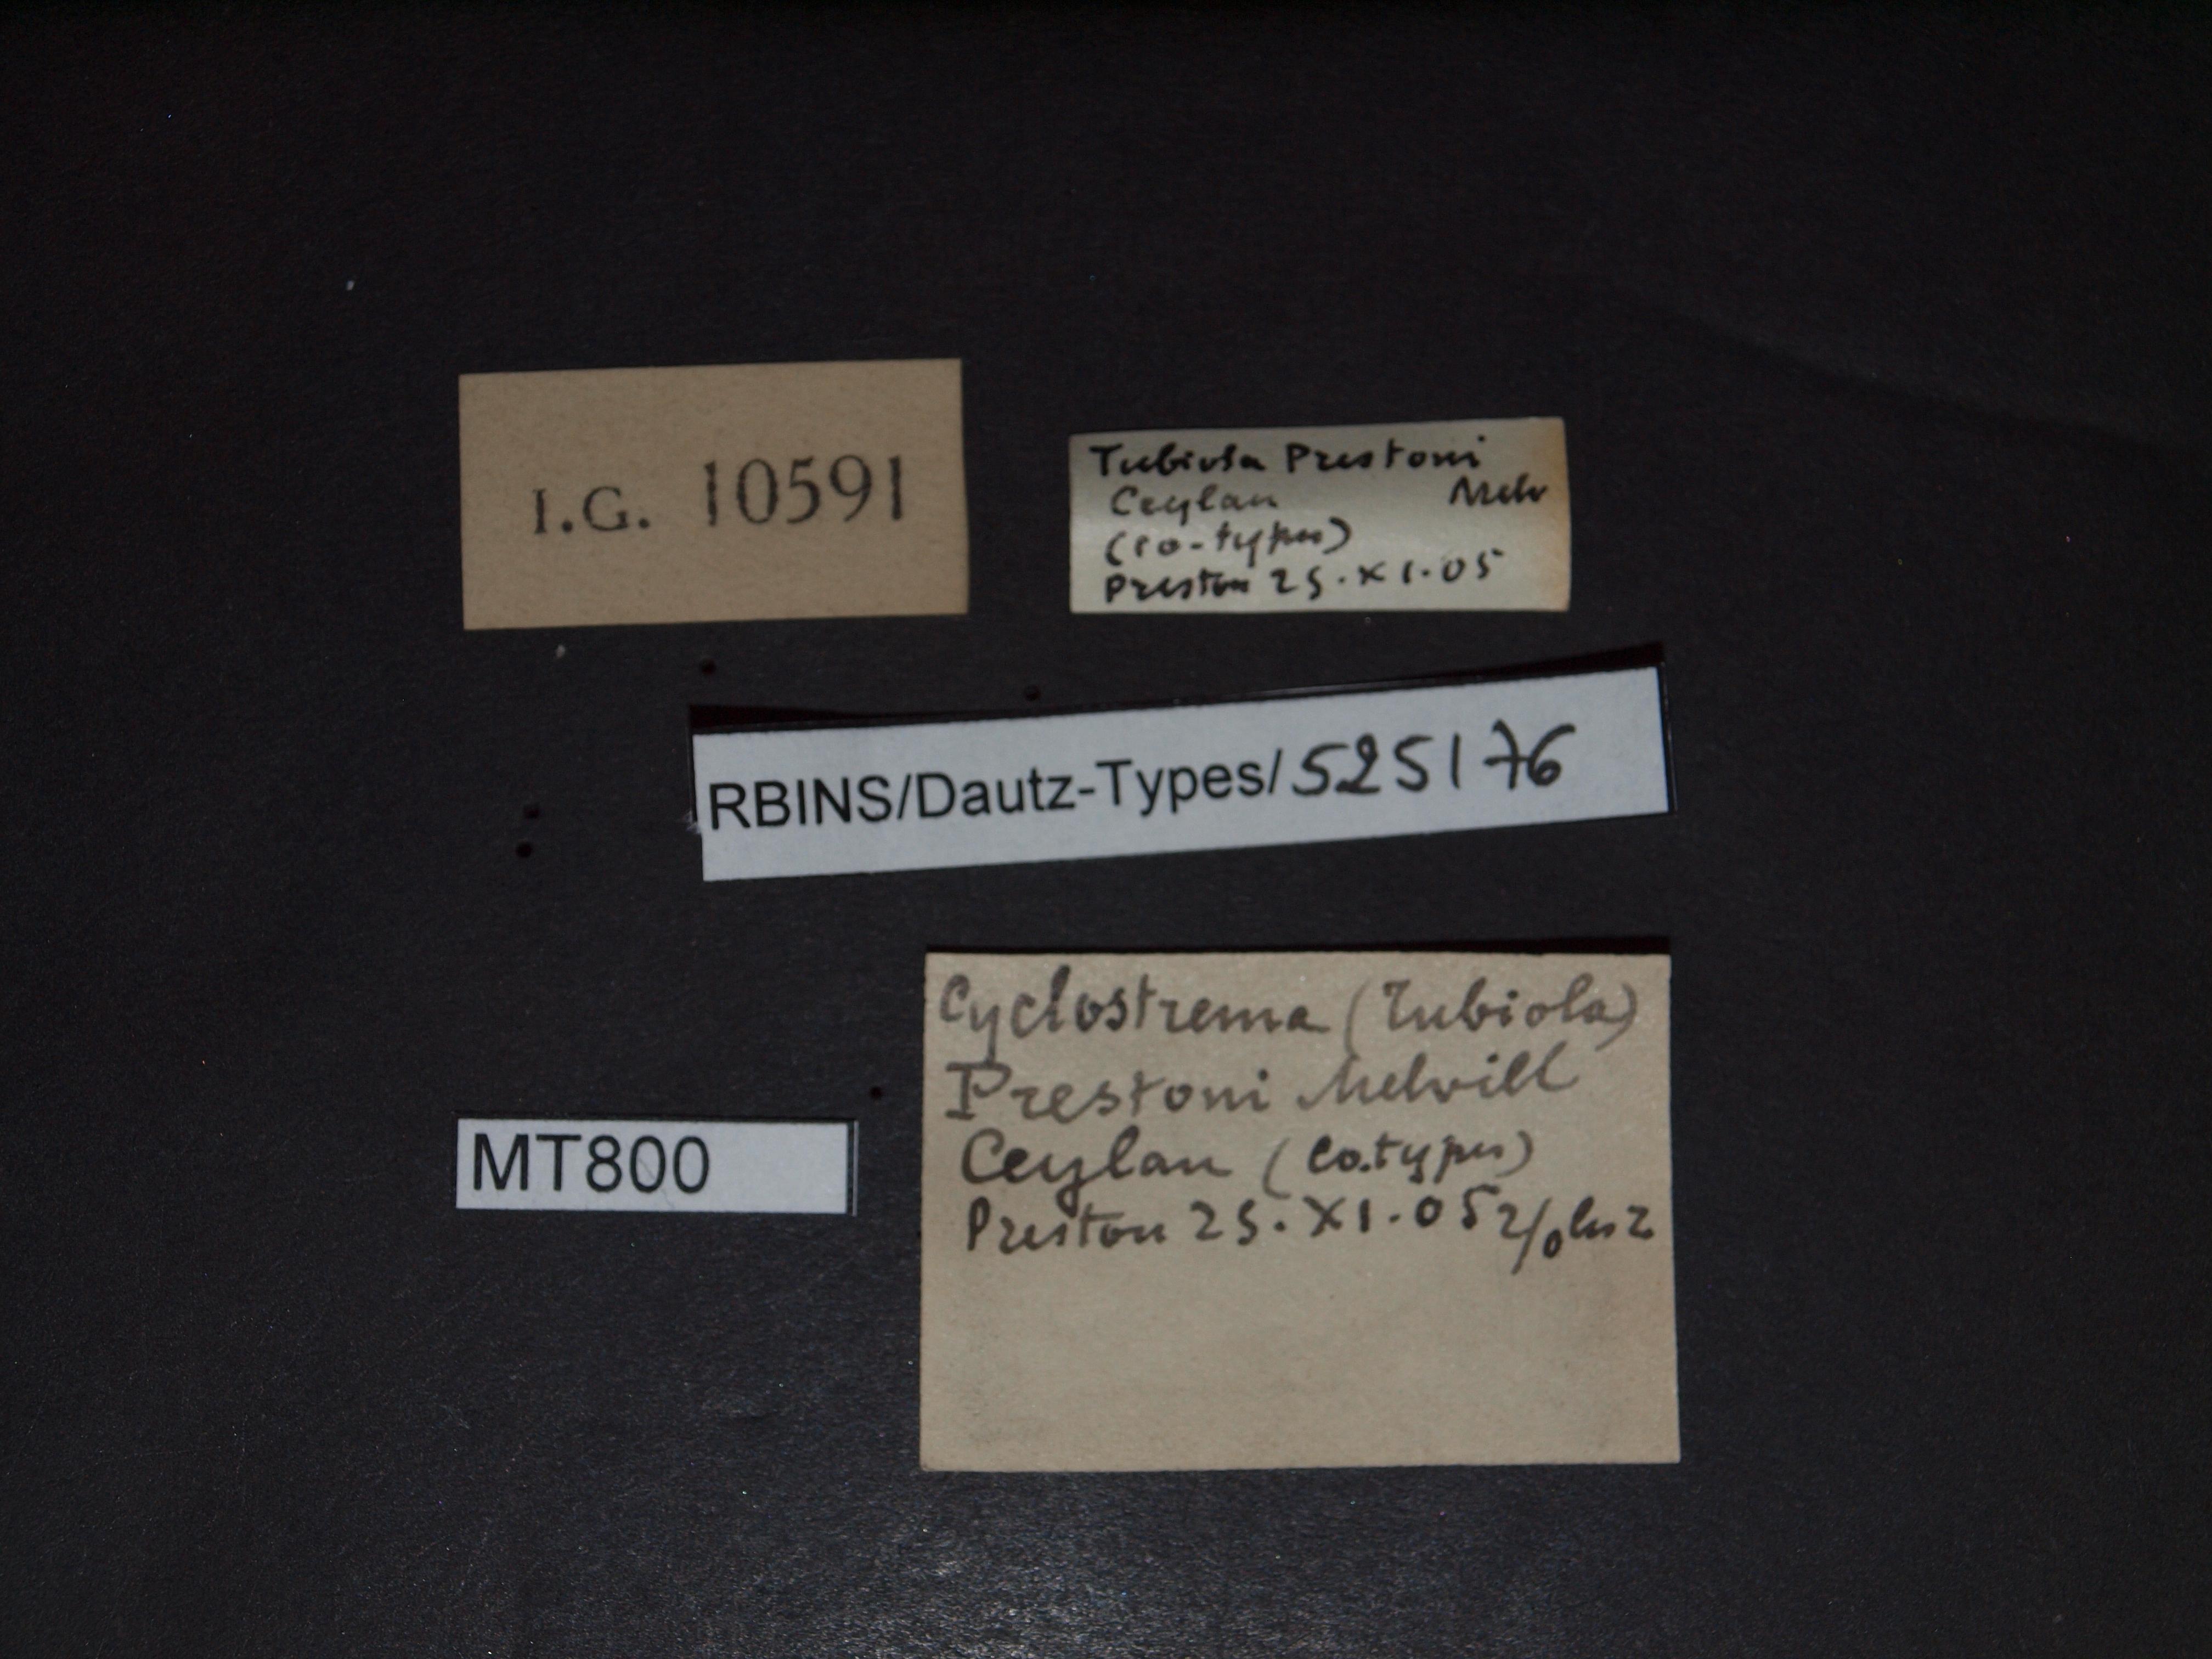 BE-RBINS-INV PARATYPE MT 800 Cyclostrema (Tubiola) prestoni LABELS.jpg